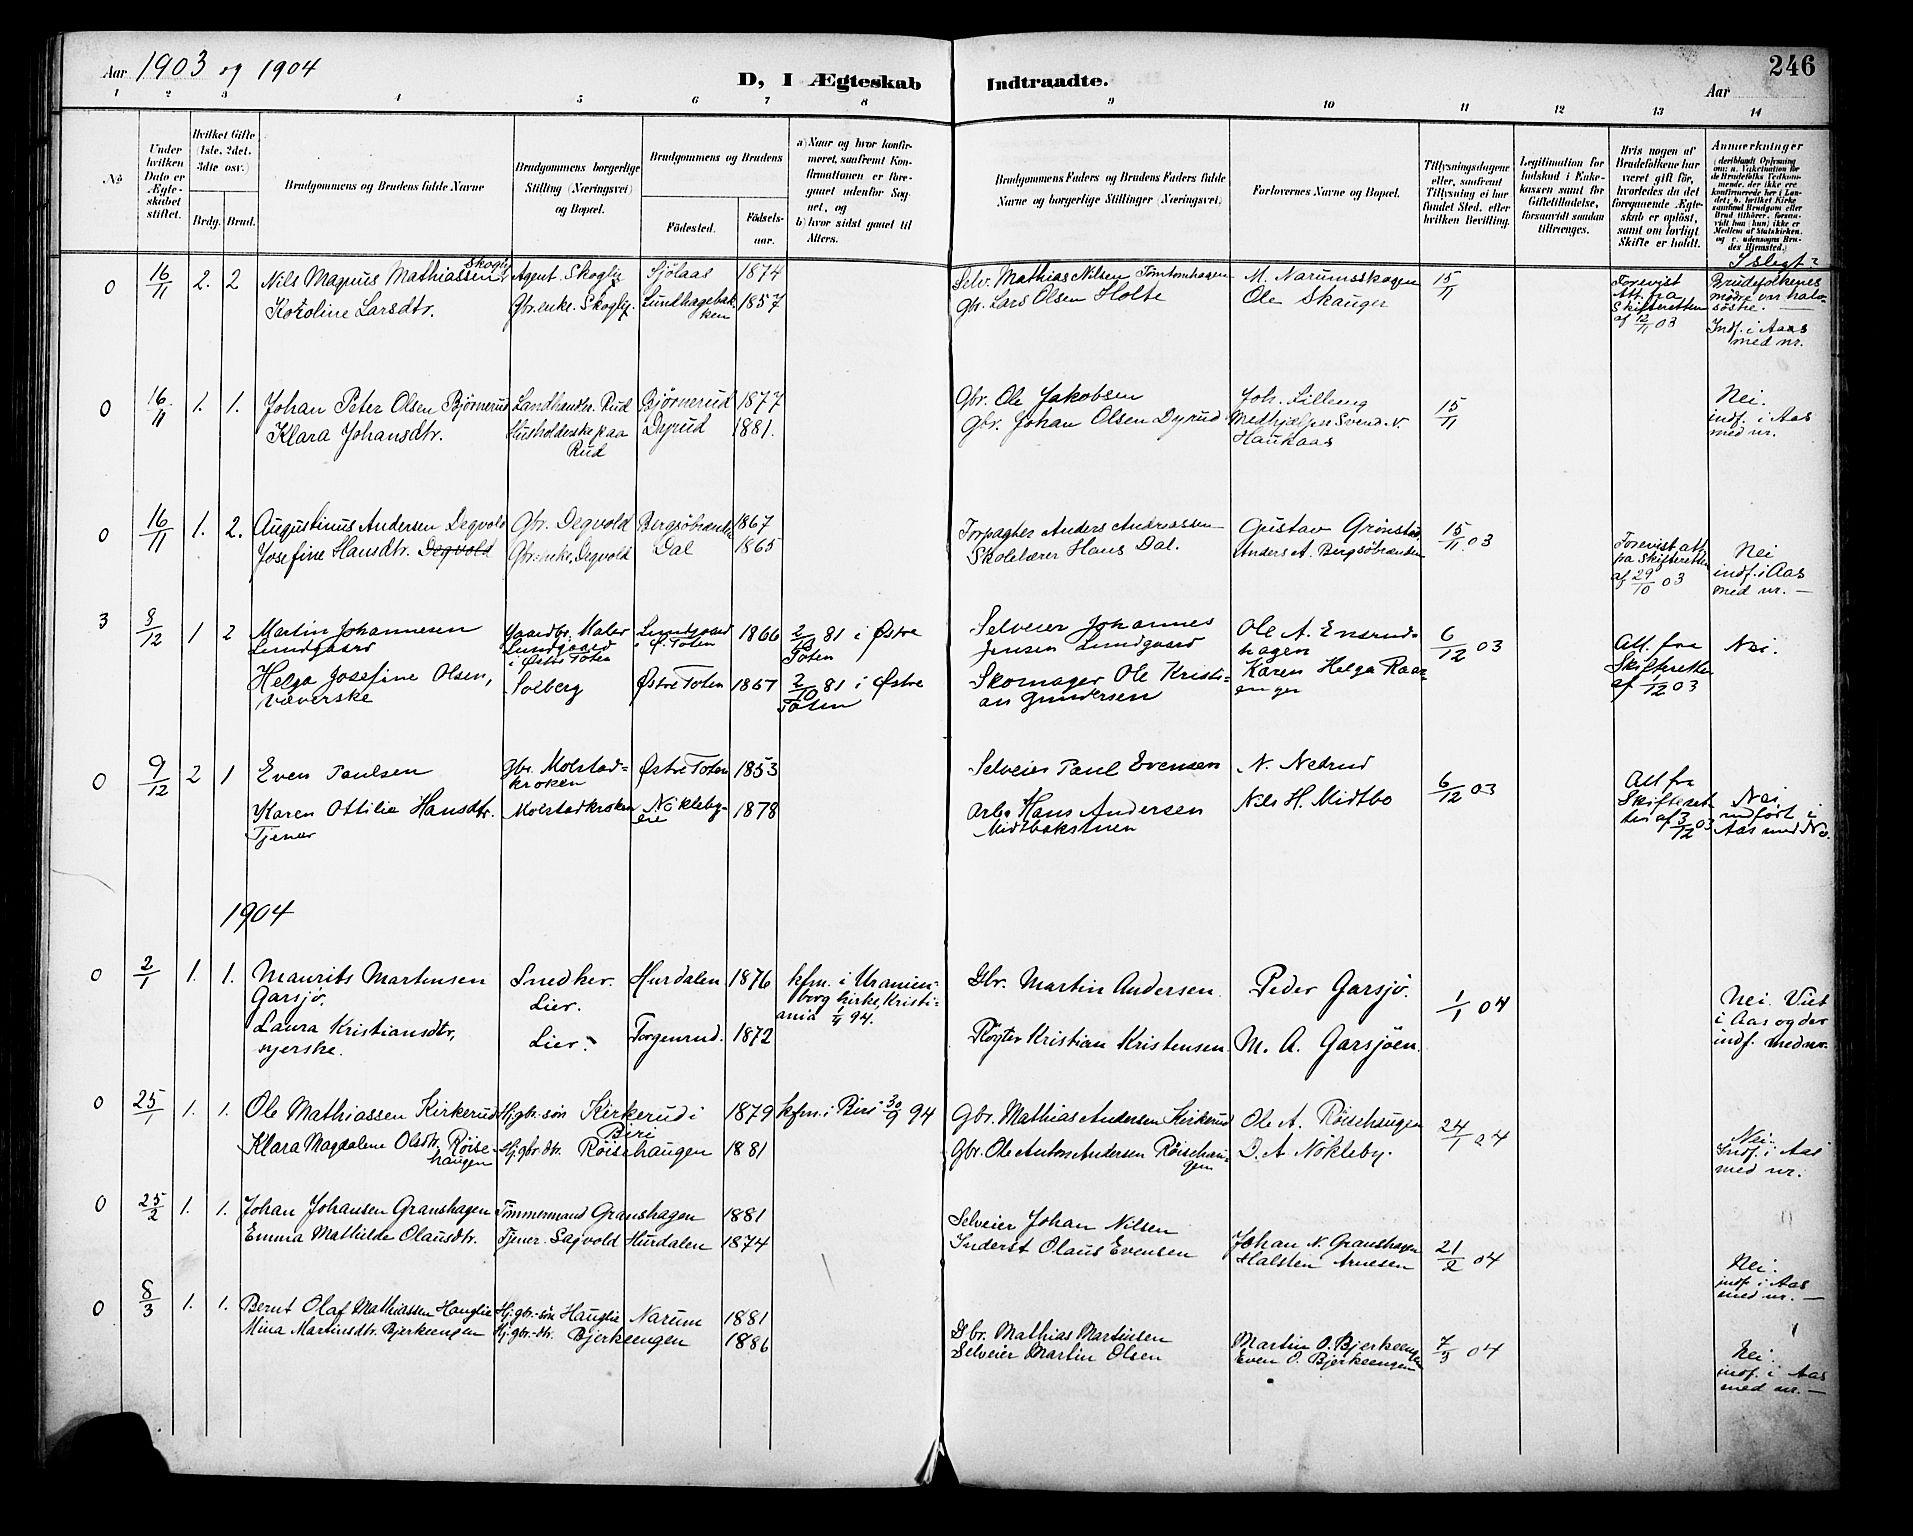 SAH, Vestre Toten prestekontor, H/Ha/Haa/L0013: Ministerialbok nr. 13, 1895-1911, s. 246